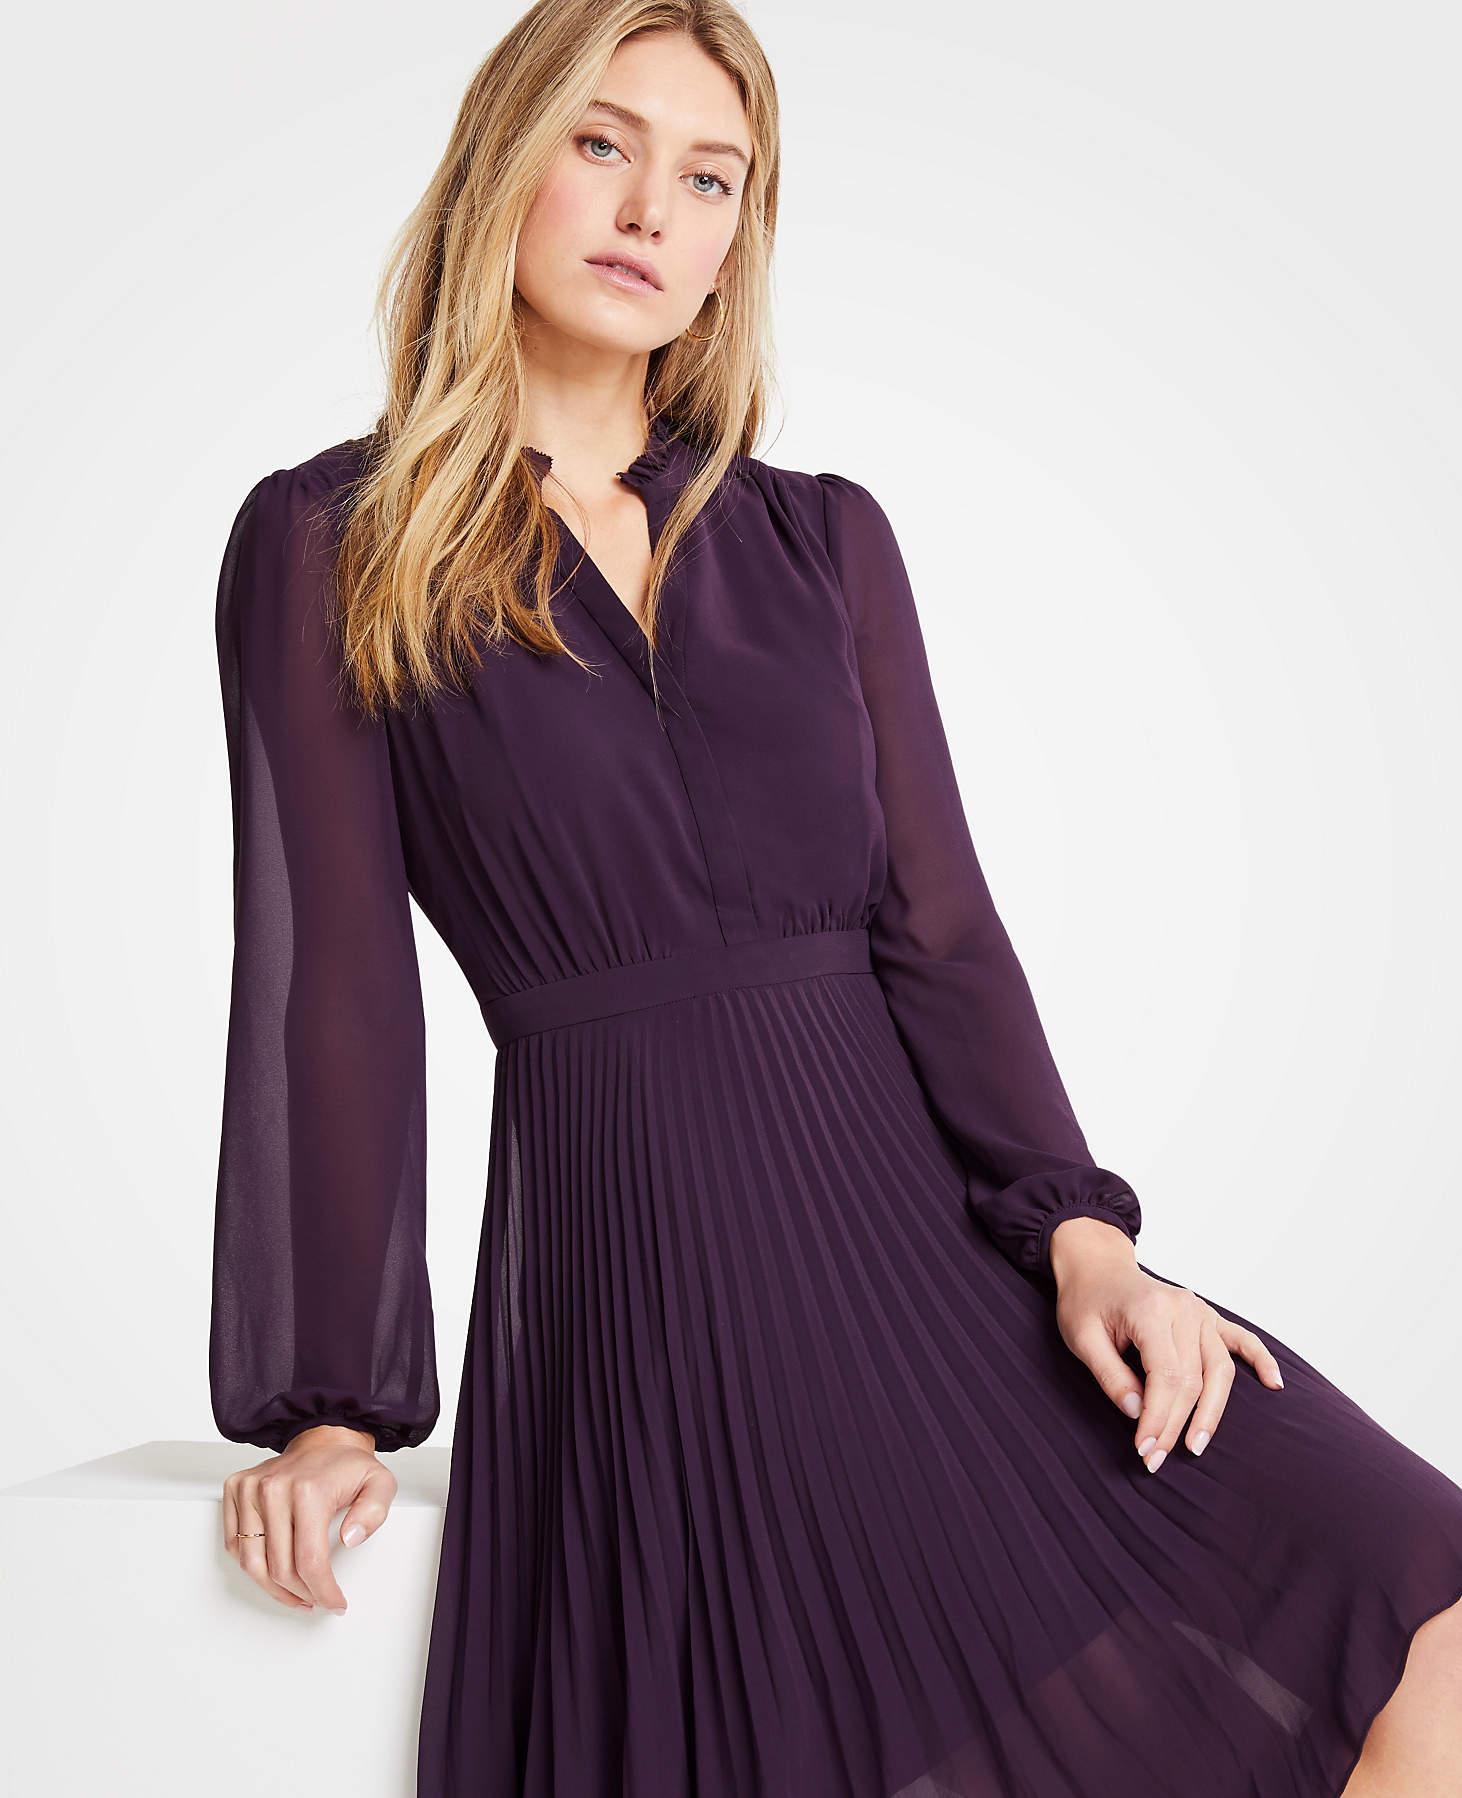 0eb1eb3f899 Ann Taylor Pleated Flare Dress in Purple - Lyst